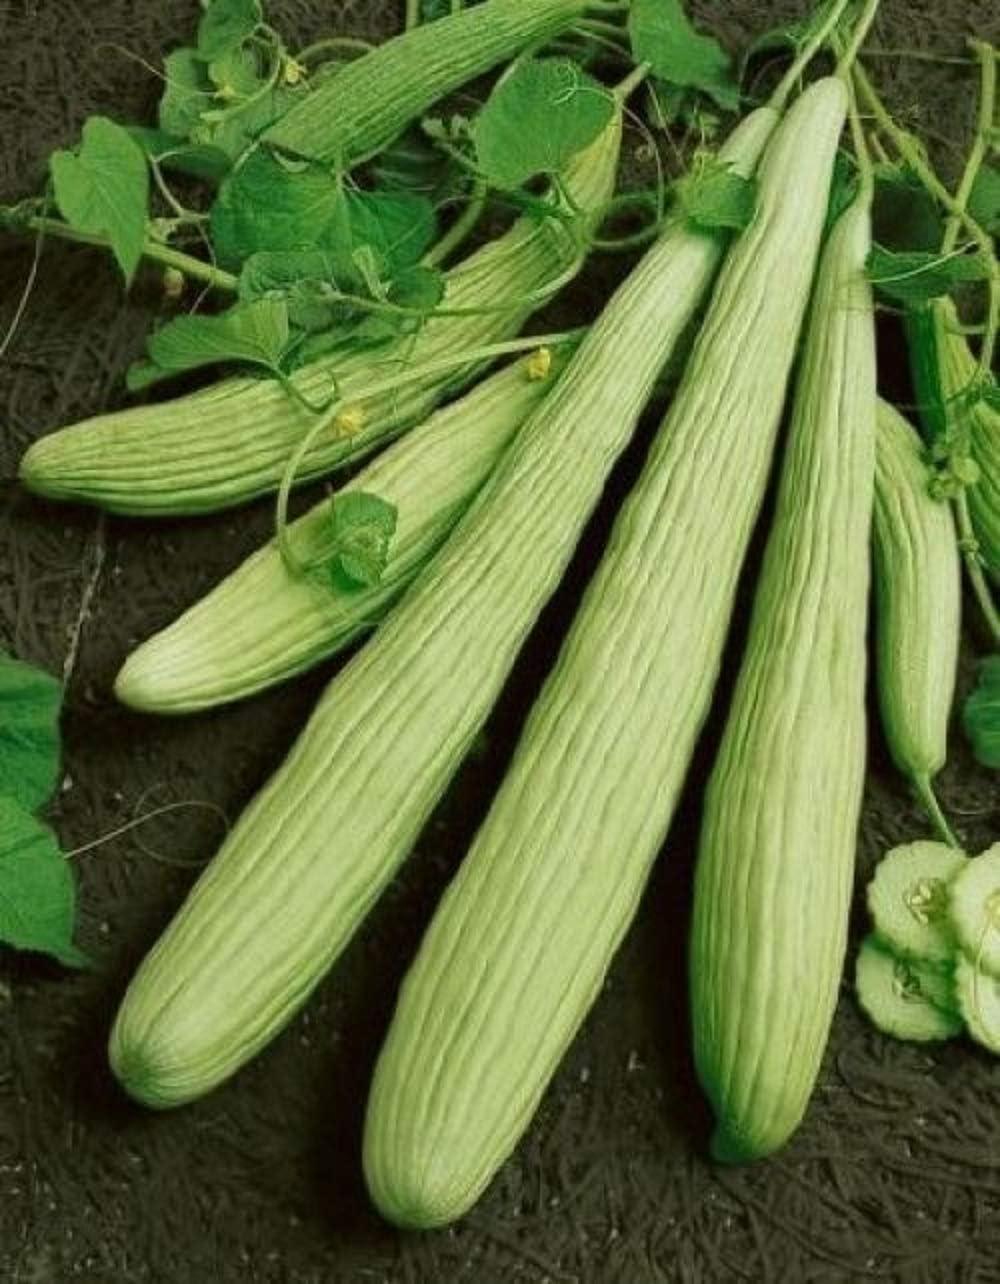 David's Garden Seeds Cucumber Slicing Armenian Yard Long SL9181 (Green) 25 Non-GMO, Heirloom Seeds